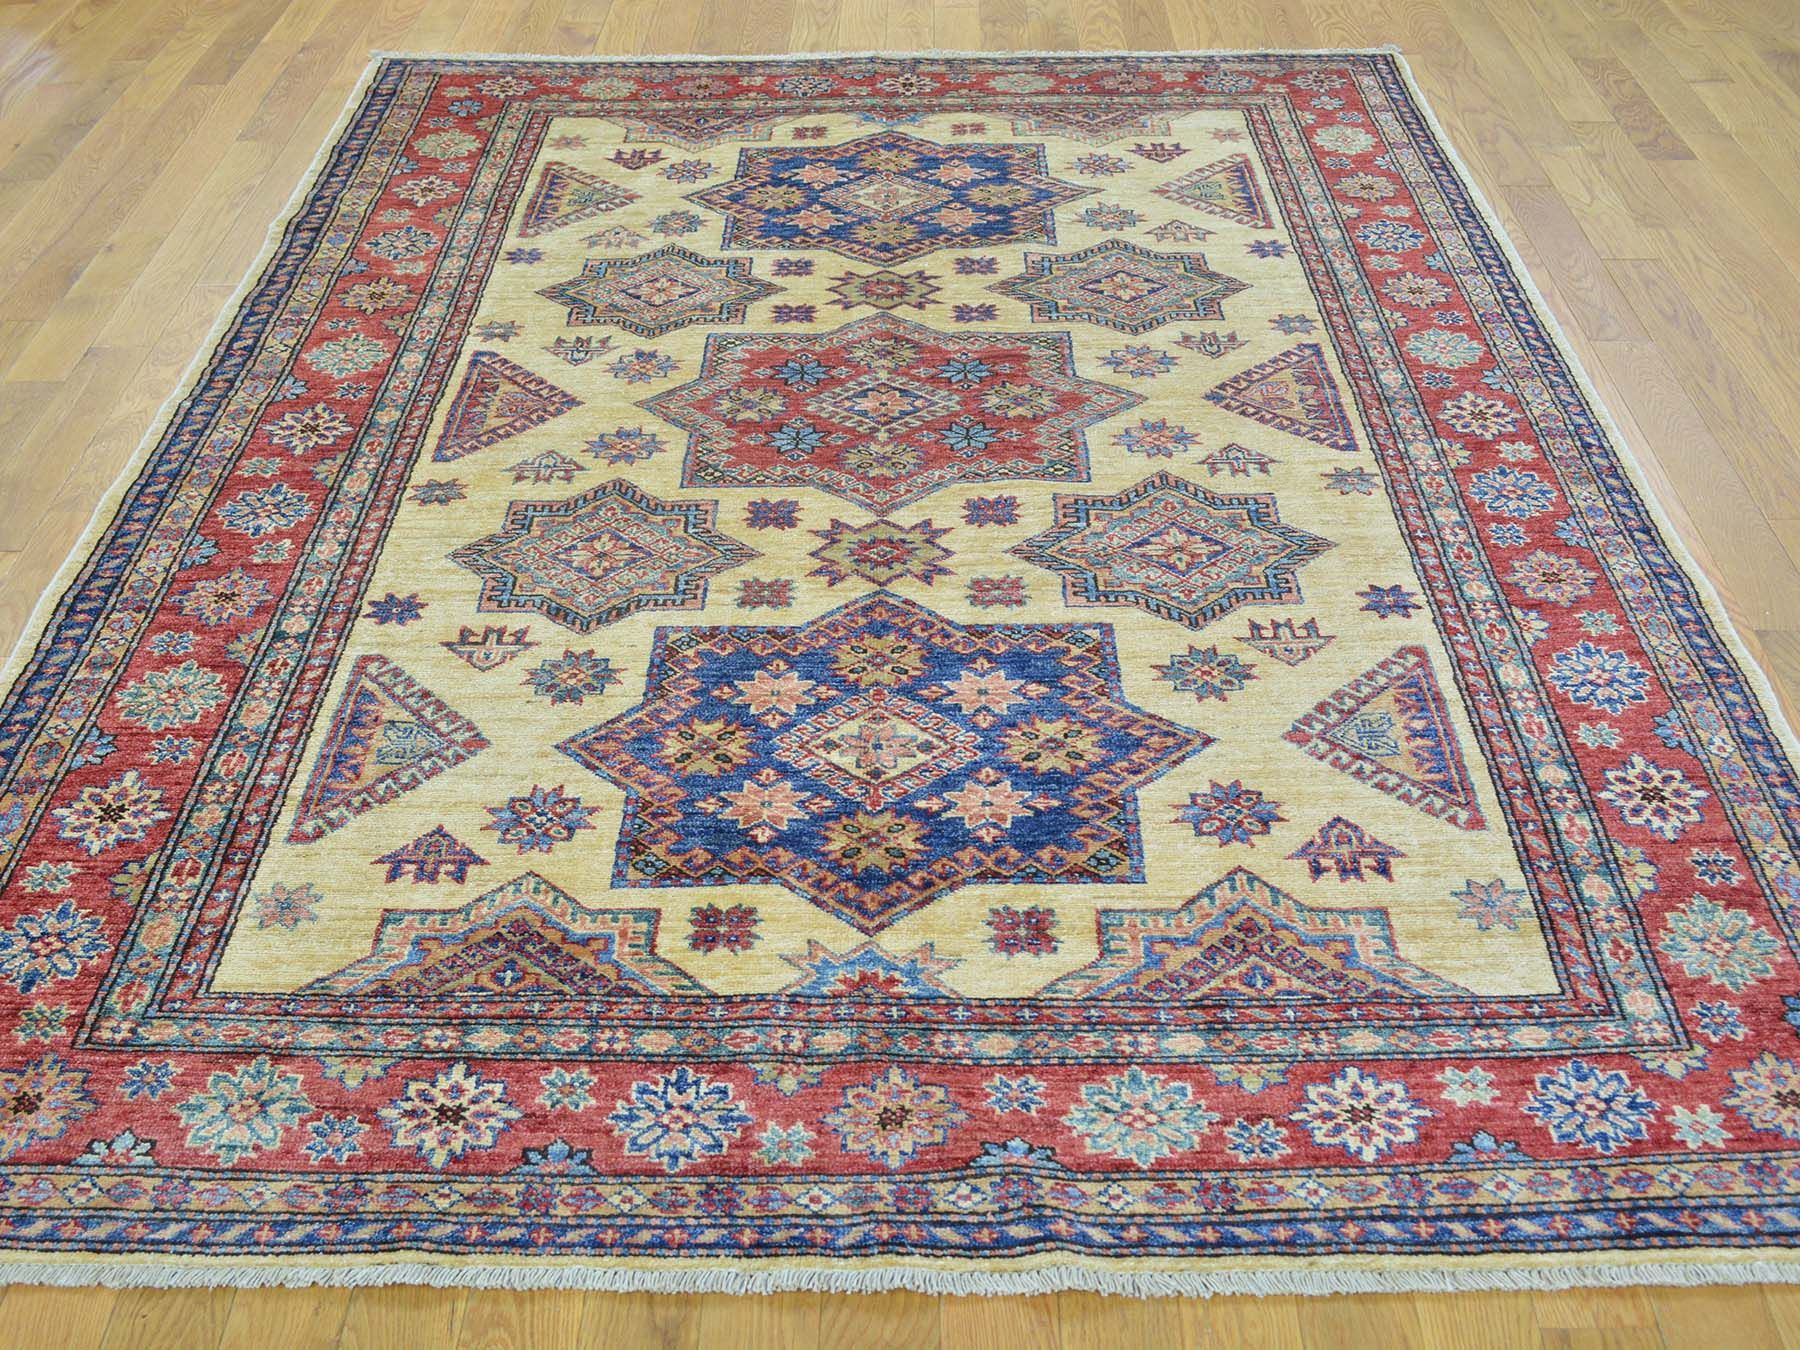 "Buy 5'8""x8' Geometric Design Super Kazak 100 Percent Wool Hand Knotted Rug  #homedecor #decor #woolrug #rugrestoration #rugpadding #orientalrugs #interior"